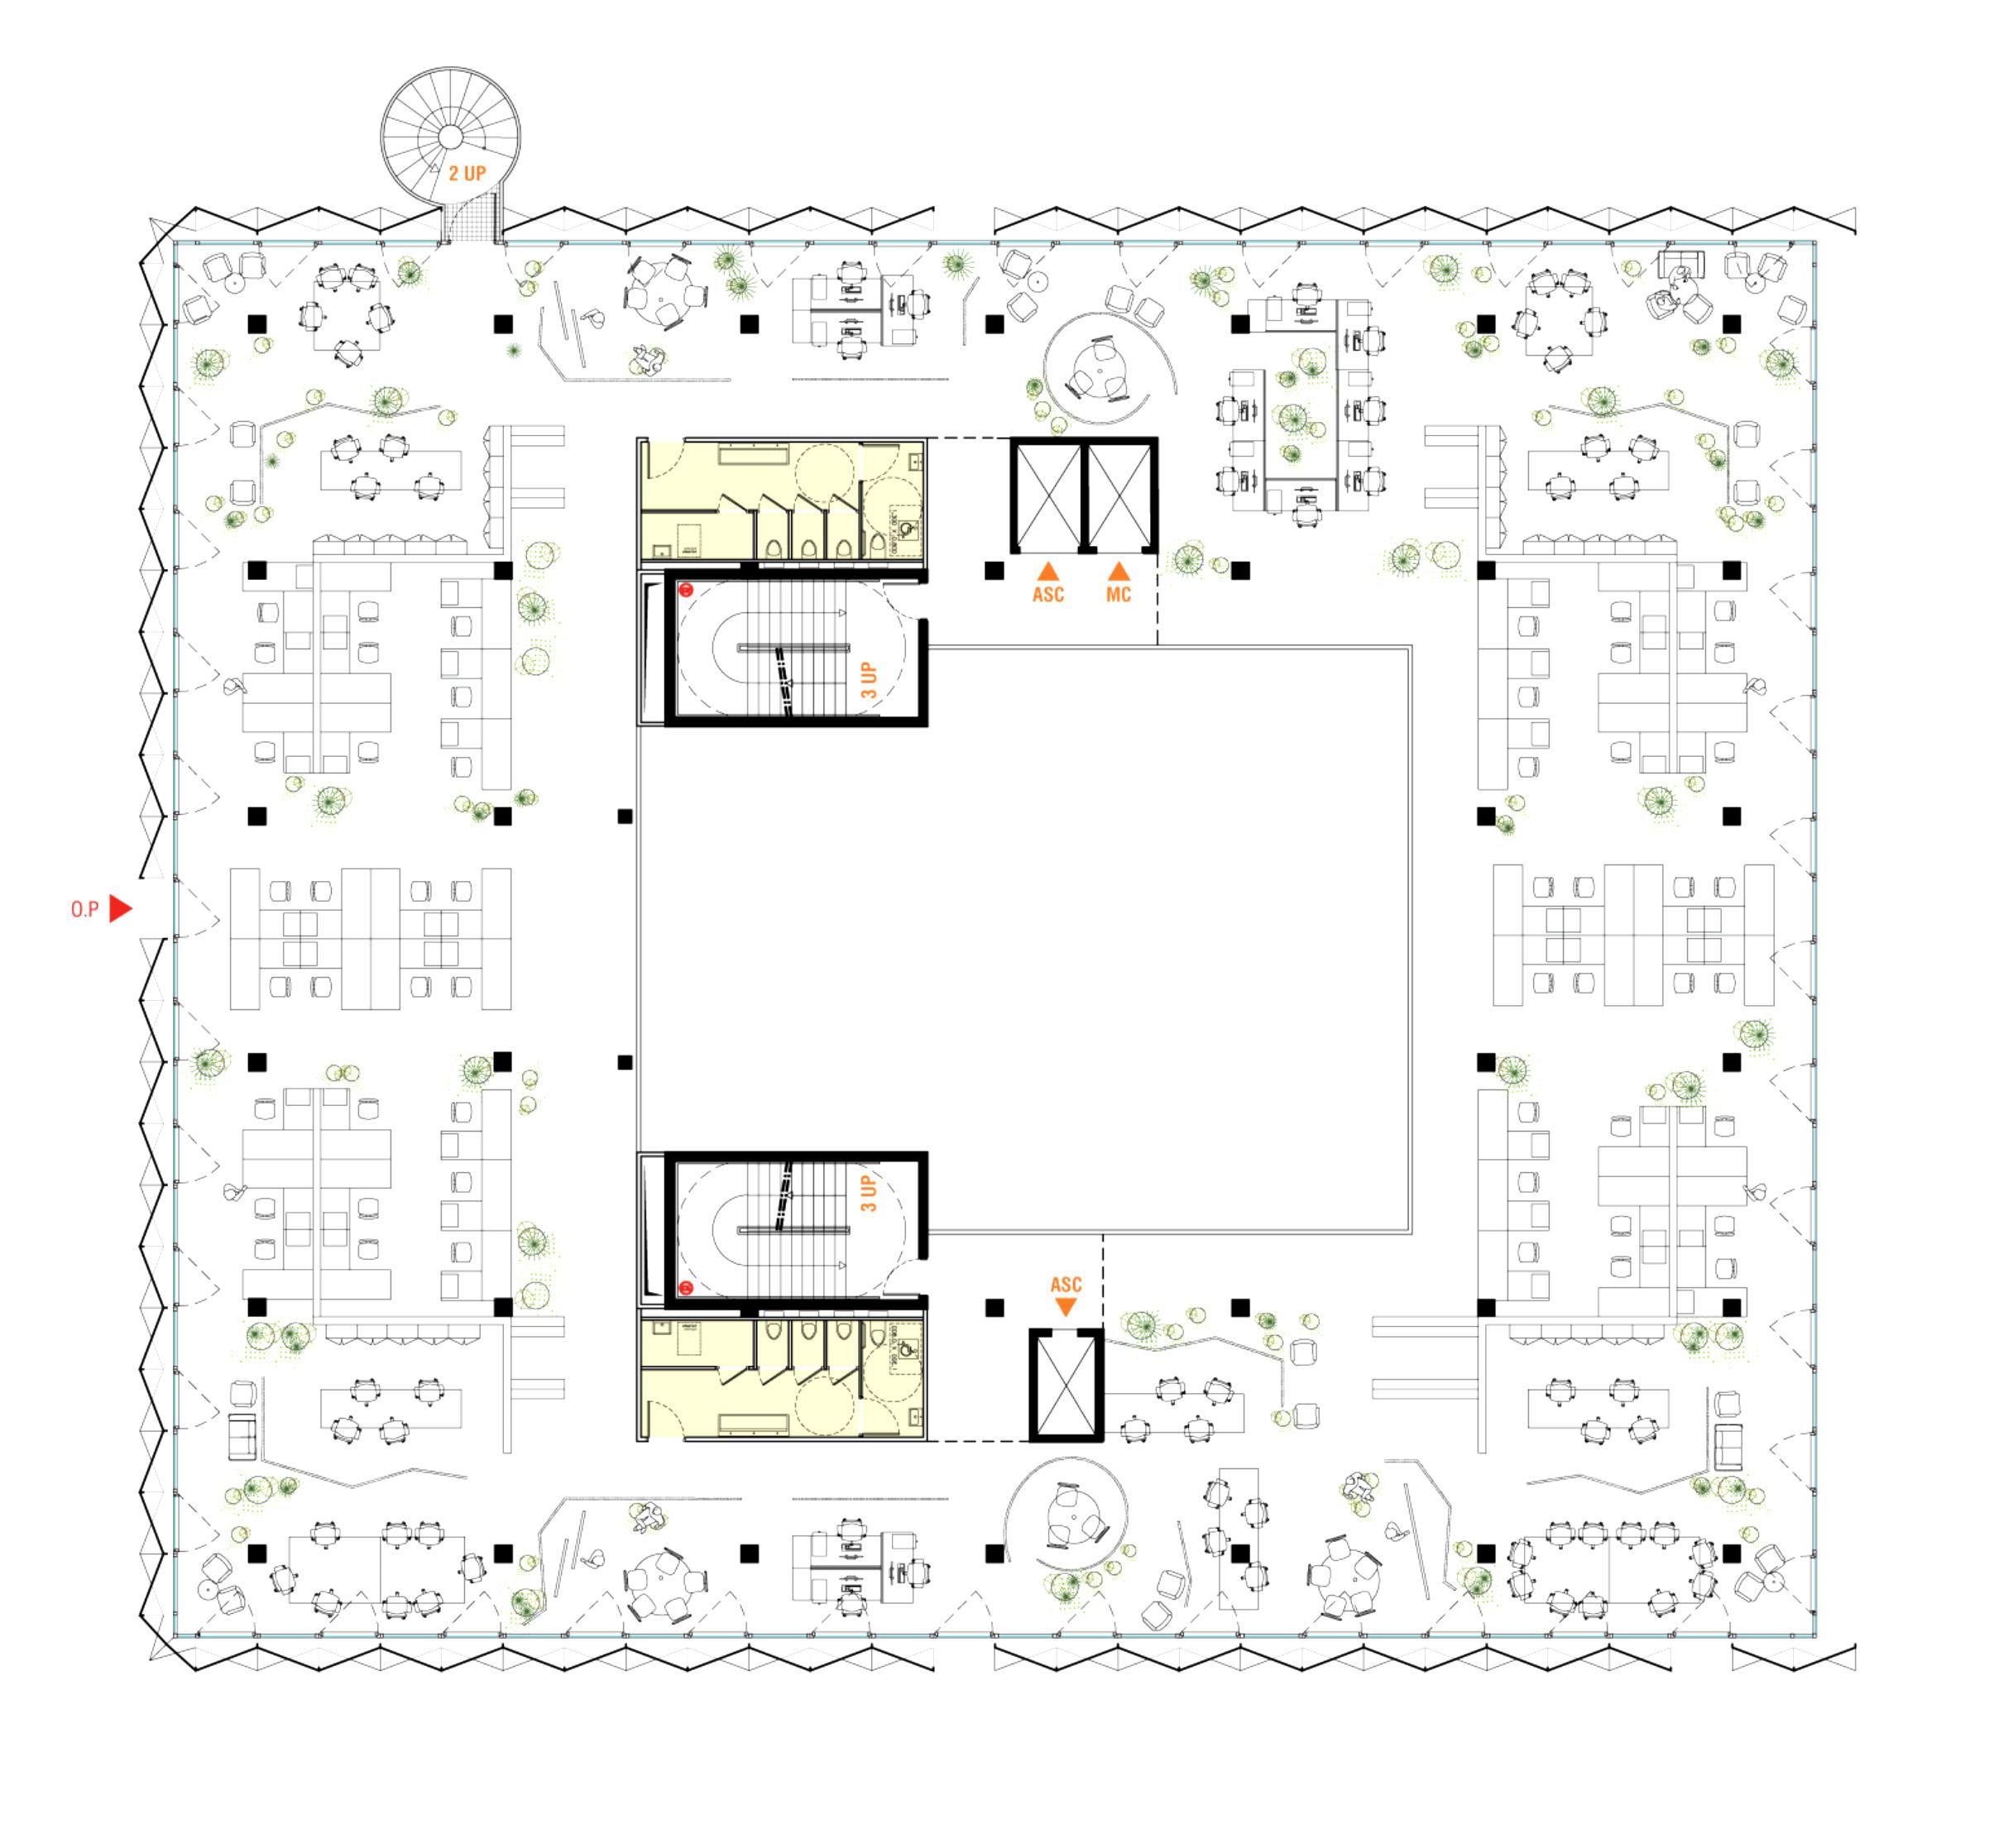 Querencia   Atelier d'architecture   Urban - Montreuil   Plan